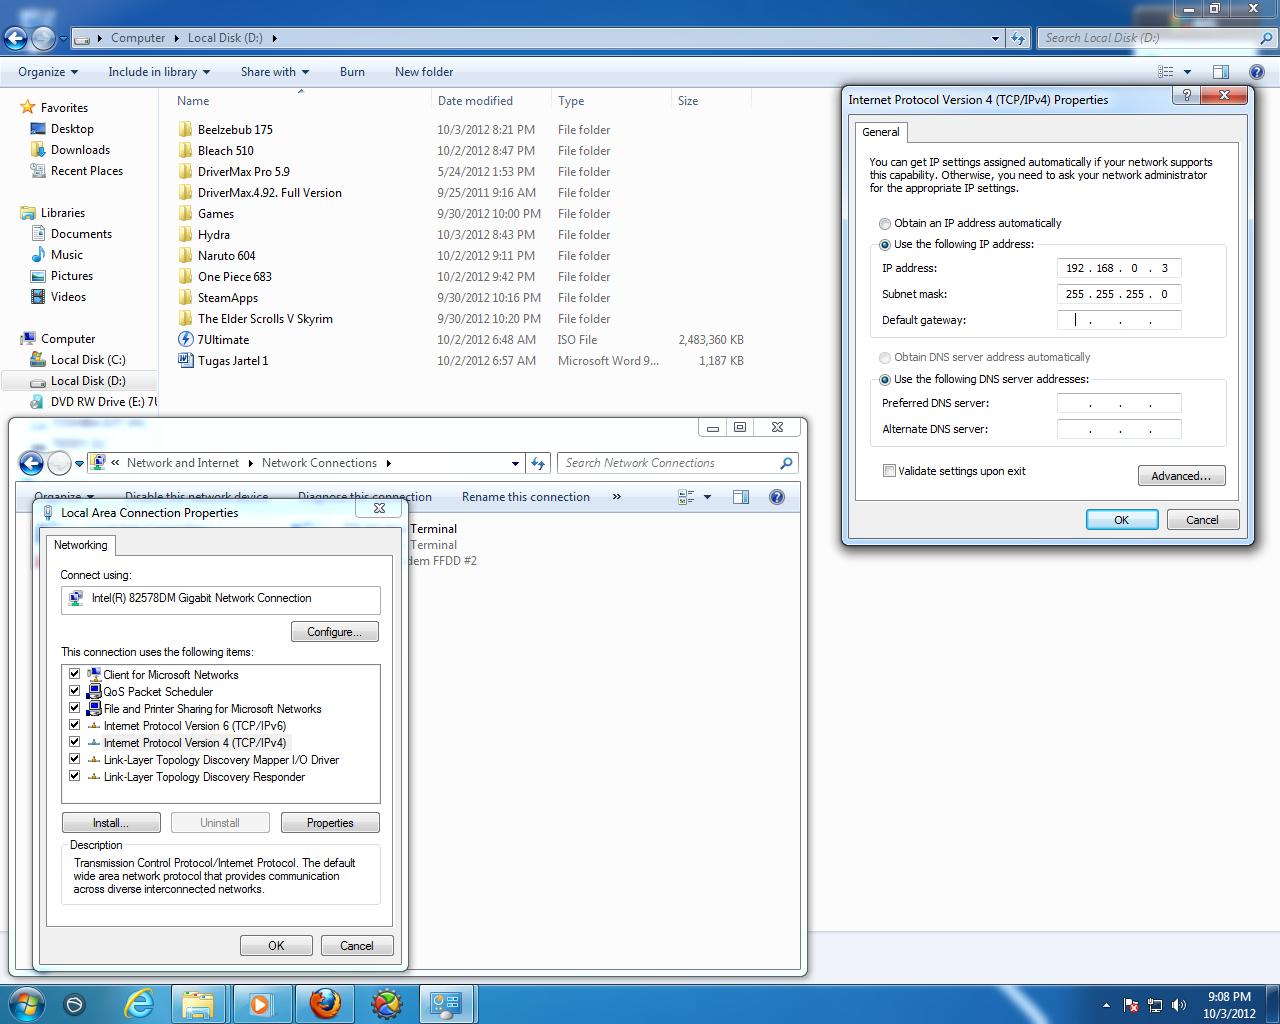 Gambar 4.1 Konfigurasi jaringan pada Windows 7.png